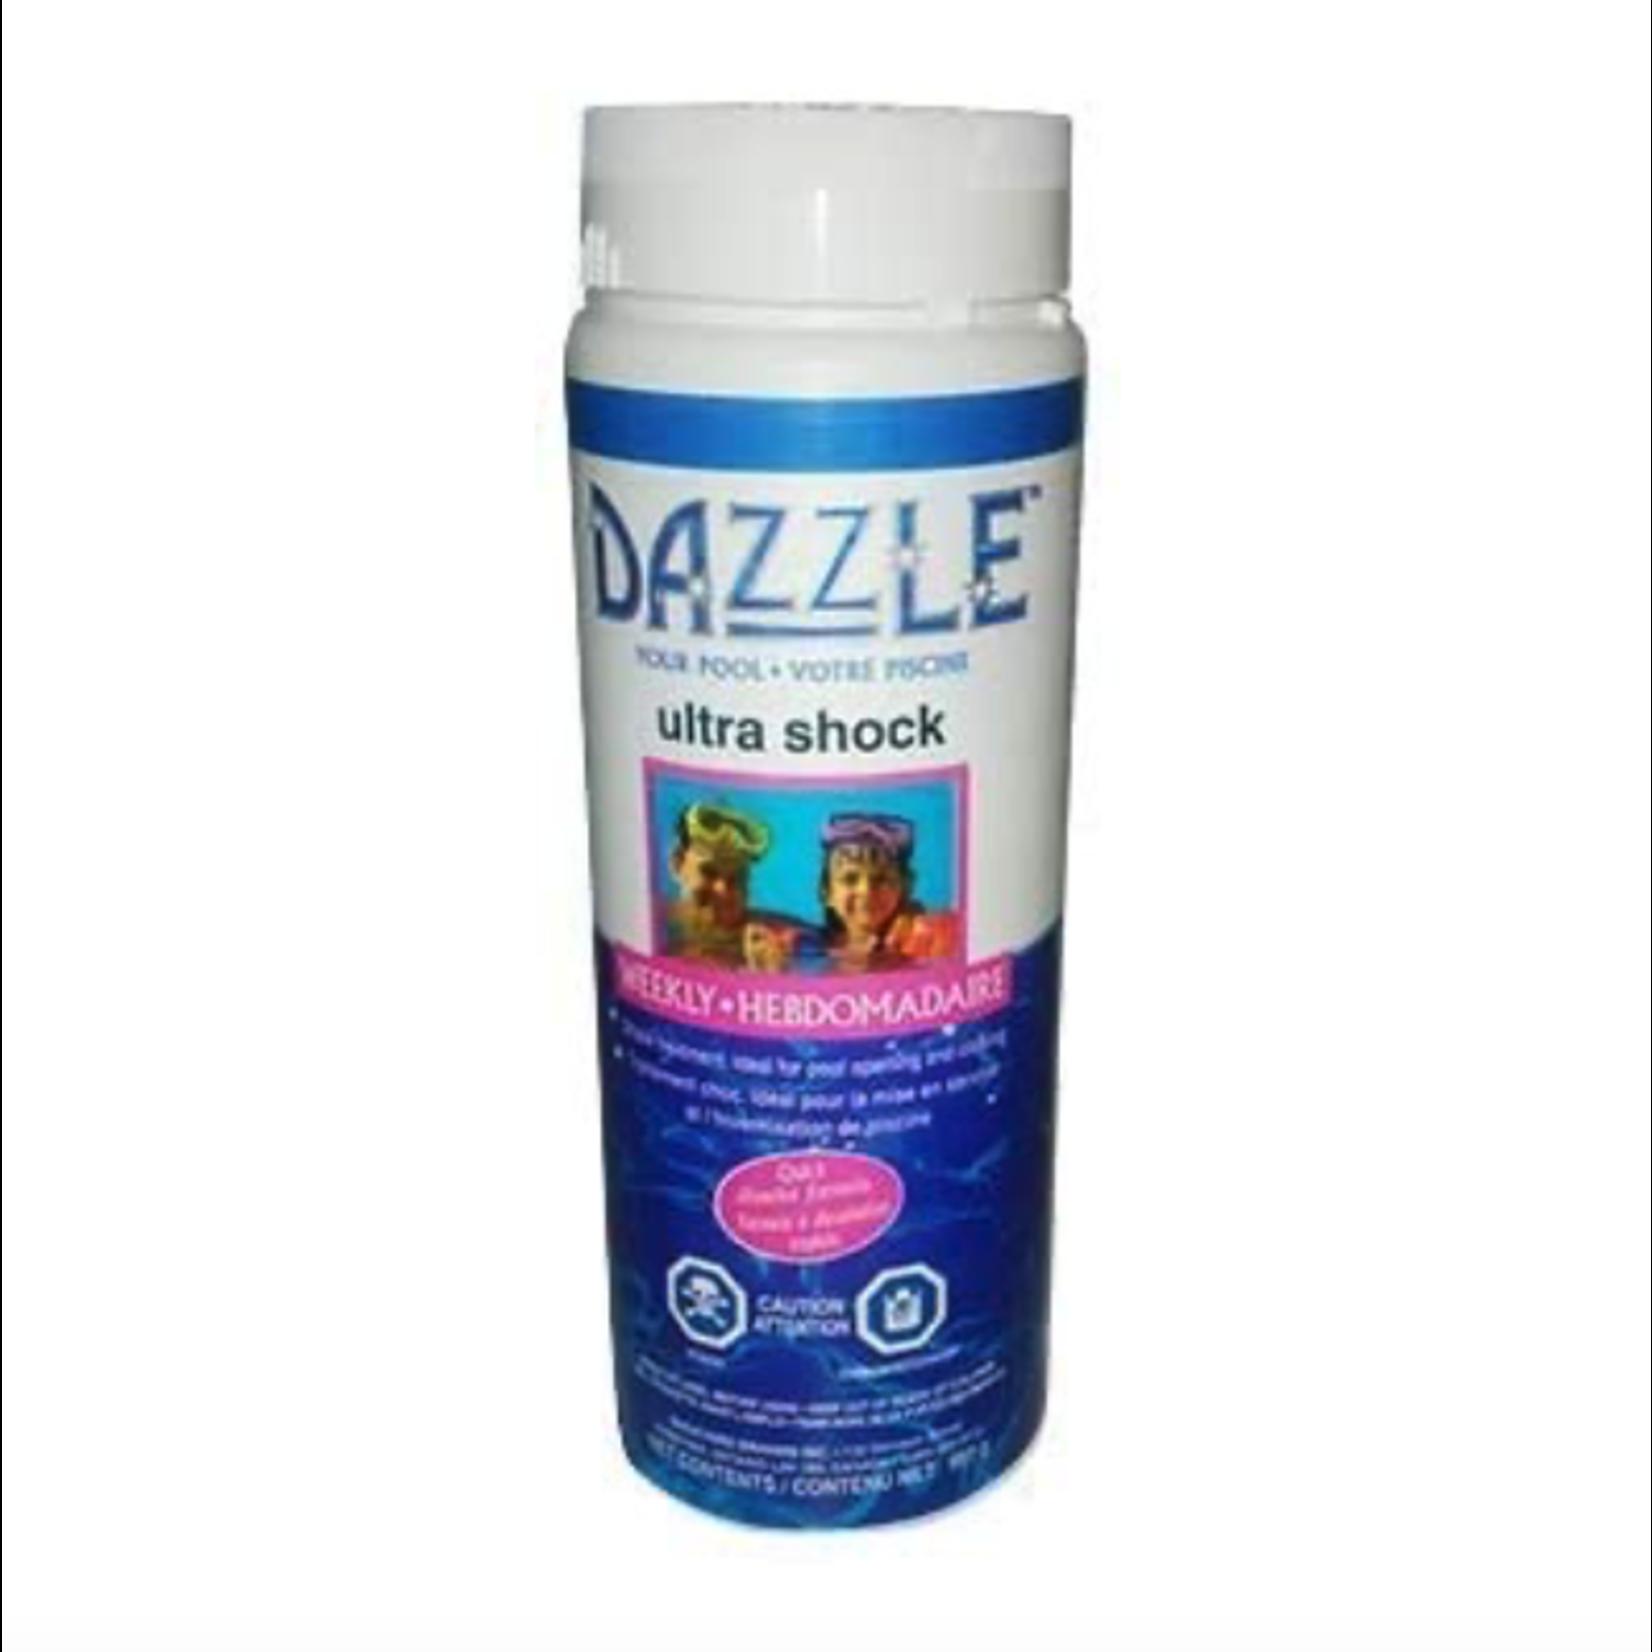 Dazzle DAZZLE ULTRA SHOCK 950G POOL